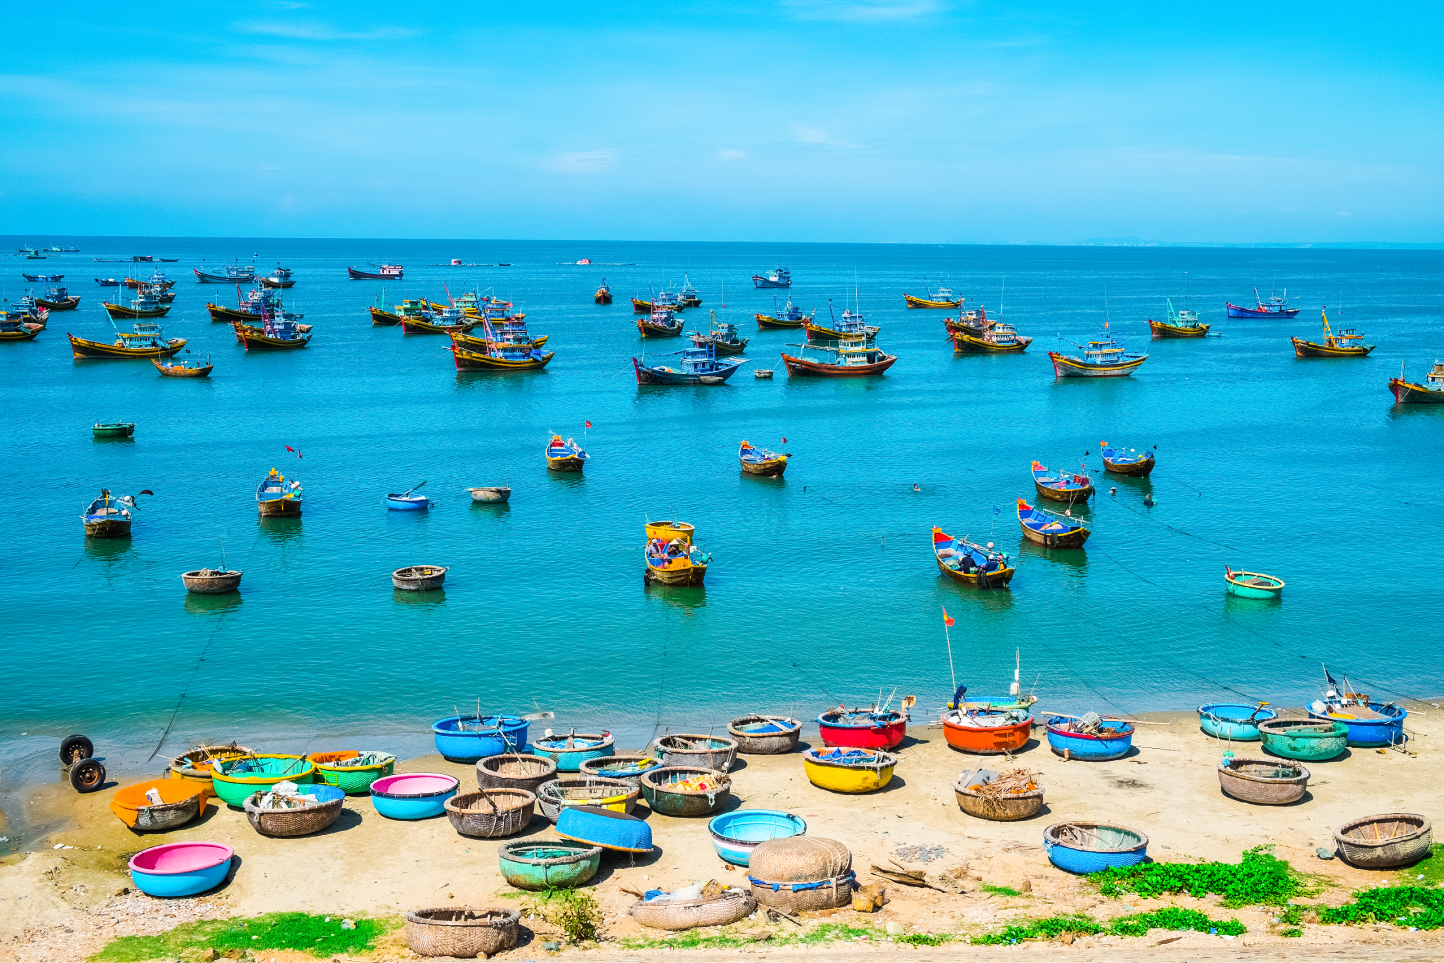 Fishing village in Mui Ne, Phan Thiet...